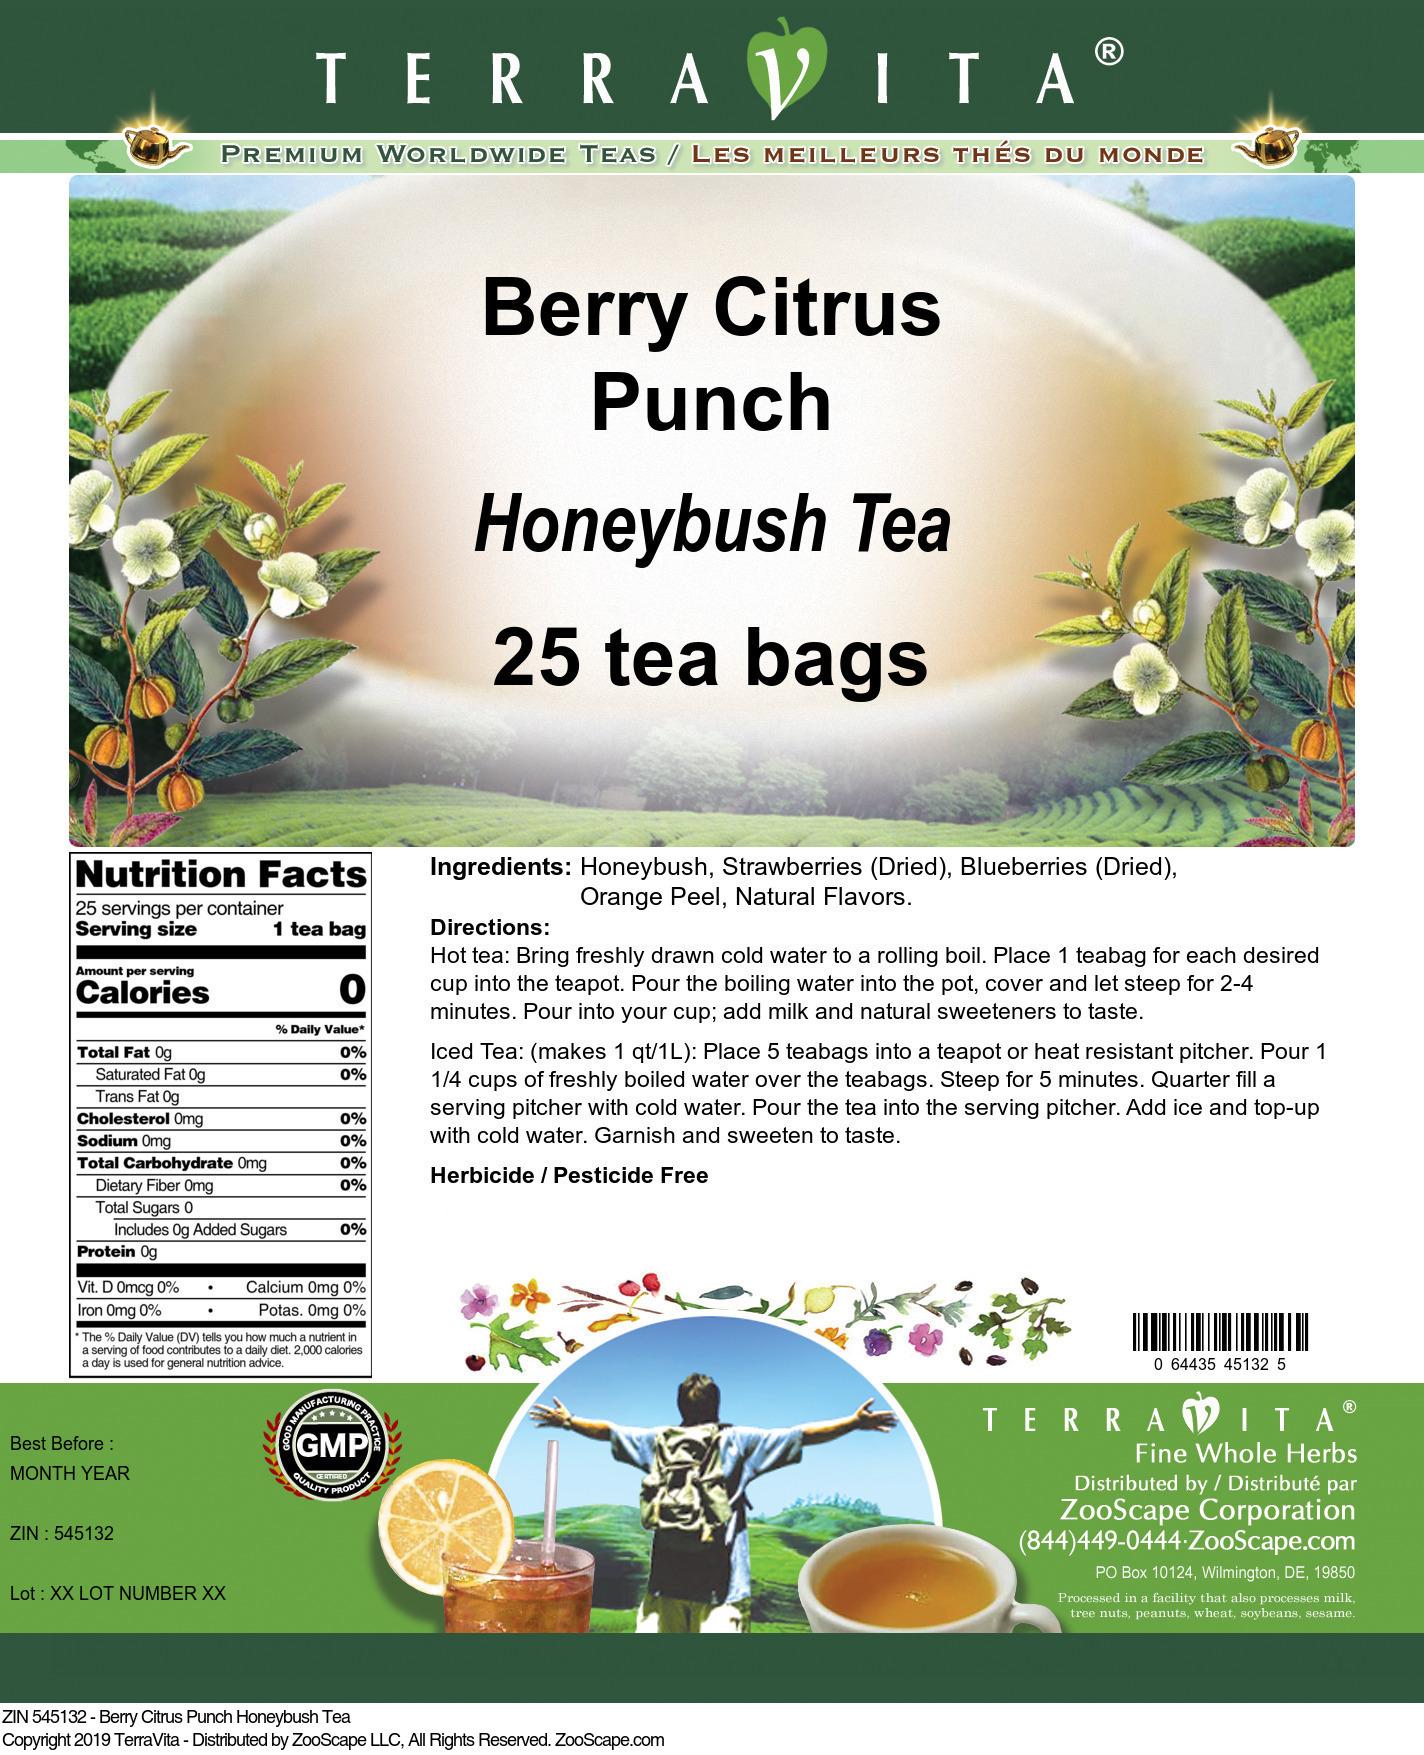 Berry Citrus Punch Honeybush Tea